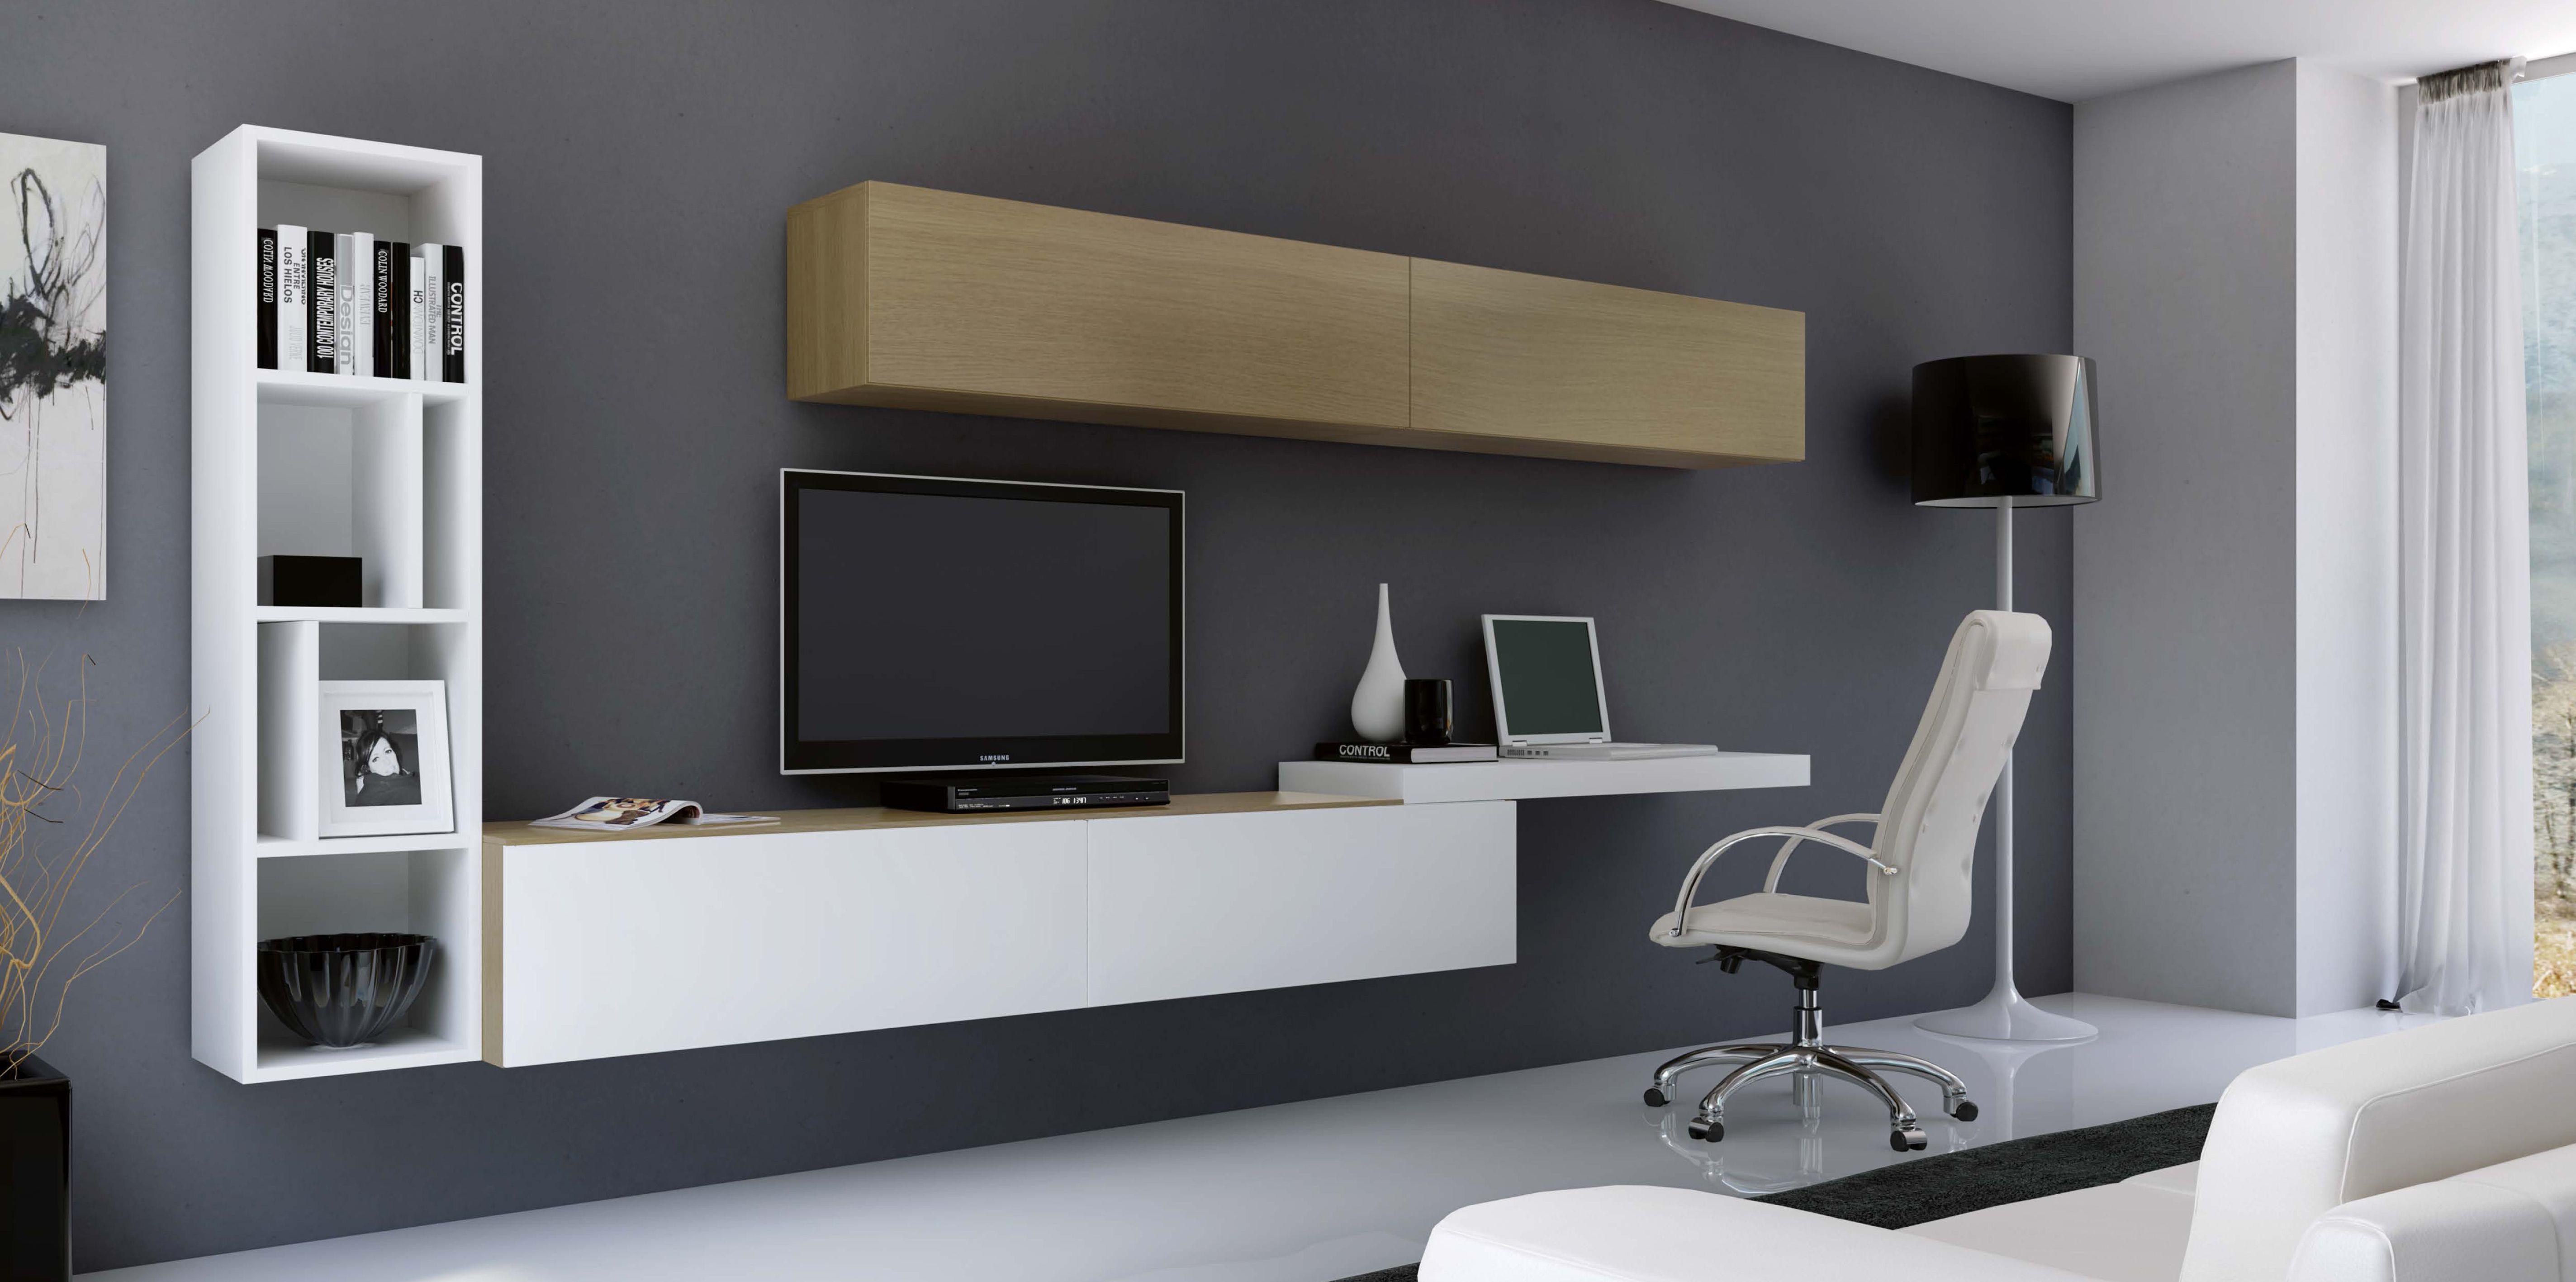 Muebles Tv Muueebleess Pinterest Mueble Tv Salon Comedor  # Muebles Suspendidos Para Tv